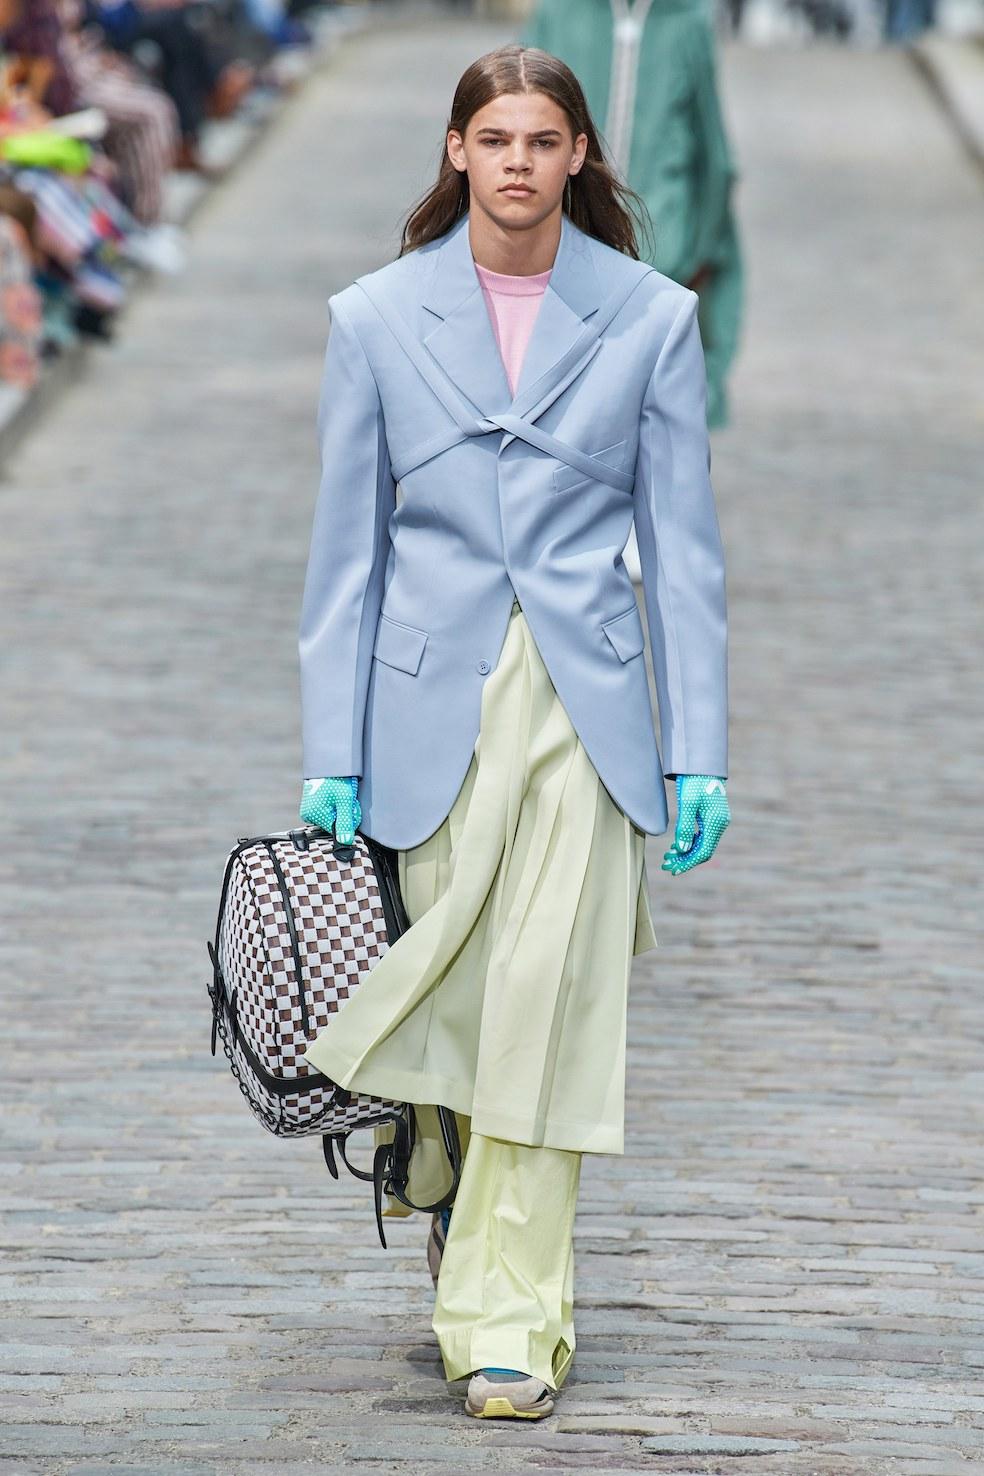 Louis_Vuitton_SS20_Behind_The_Blinds_Magazine__FIO0156.jpg